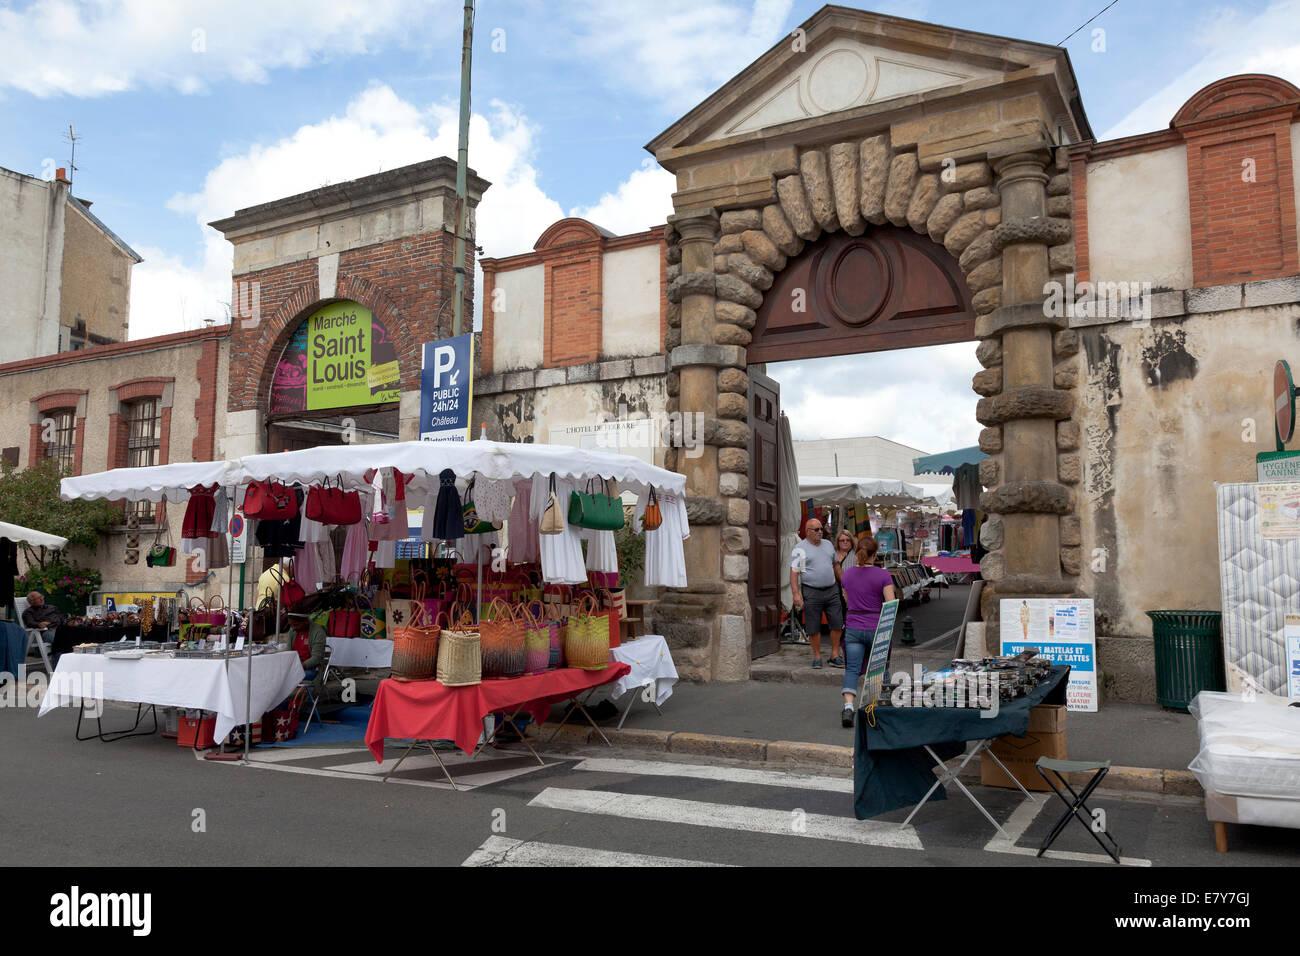 Market Saint Louis in Fontainebleau, France - Stock Image